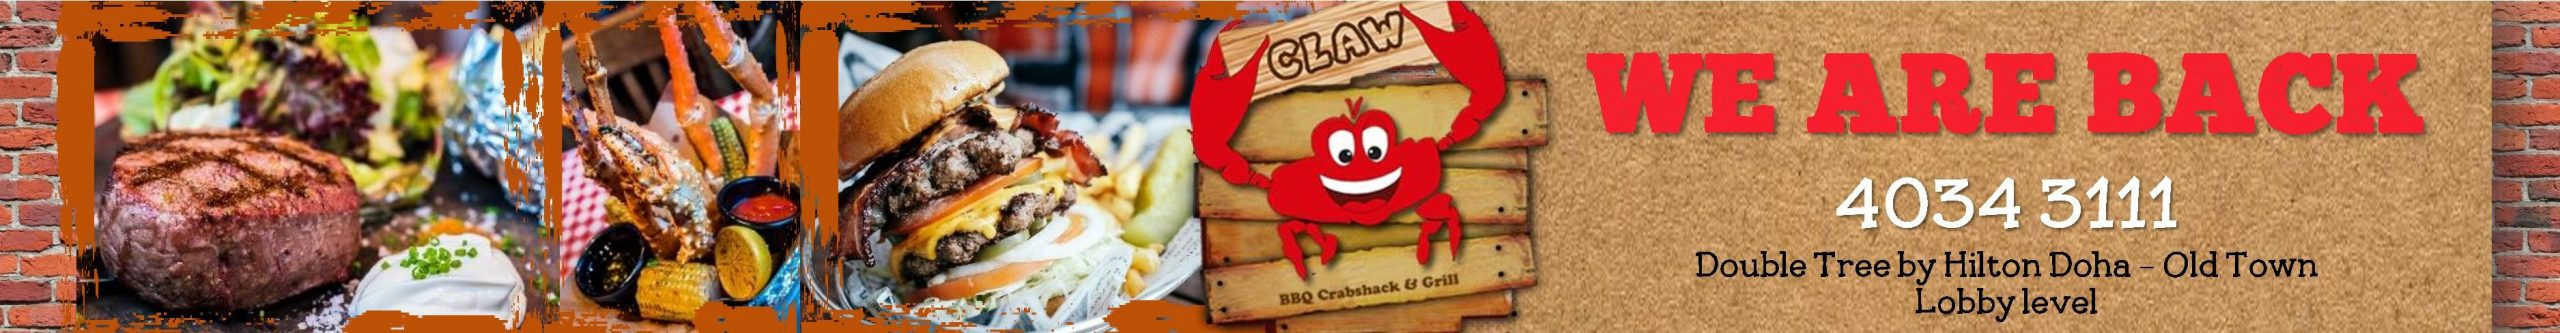 BBQ Crabshack & Grill – July